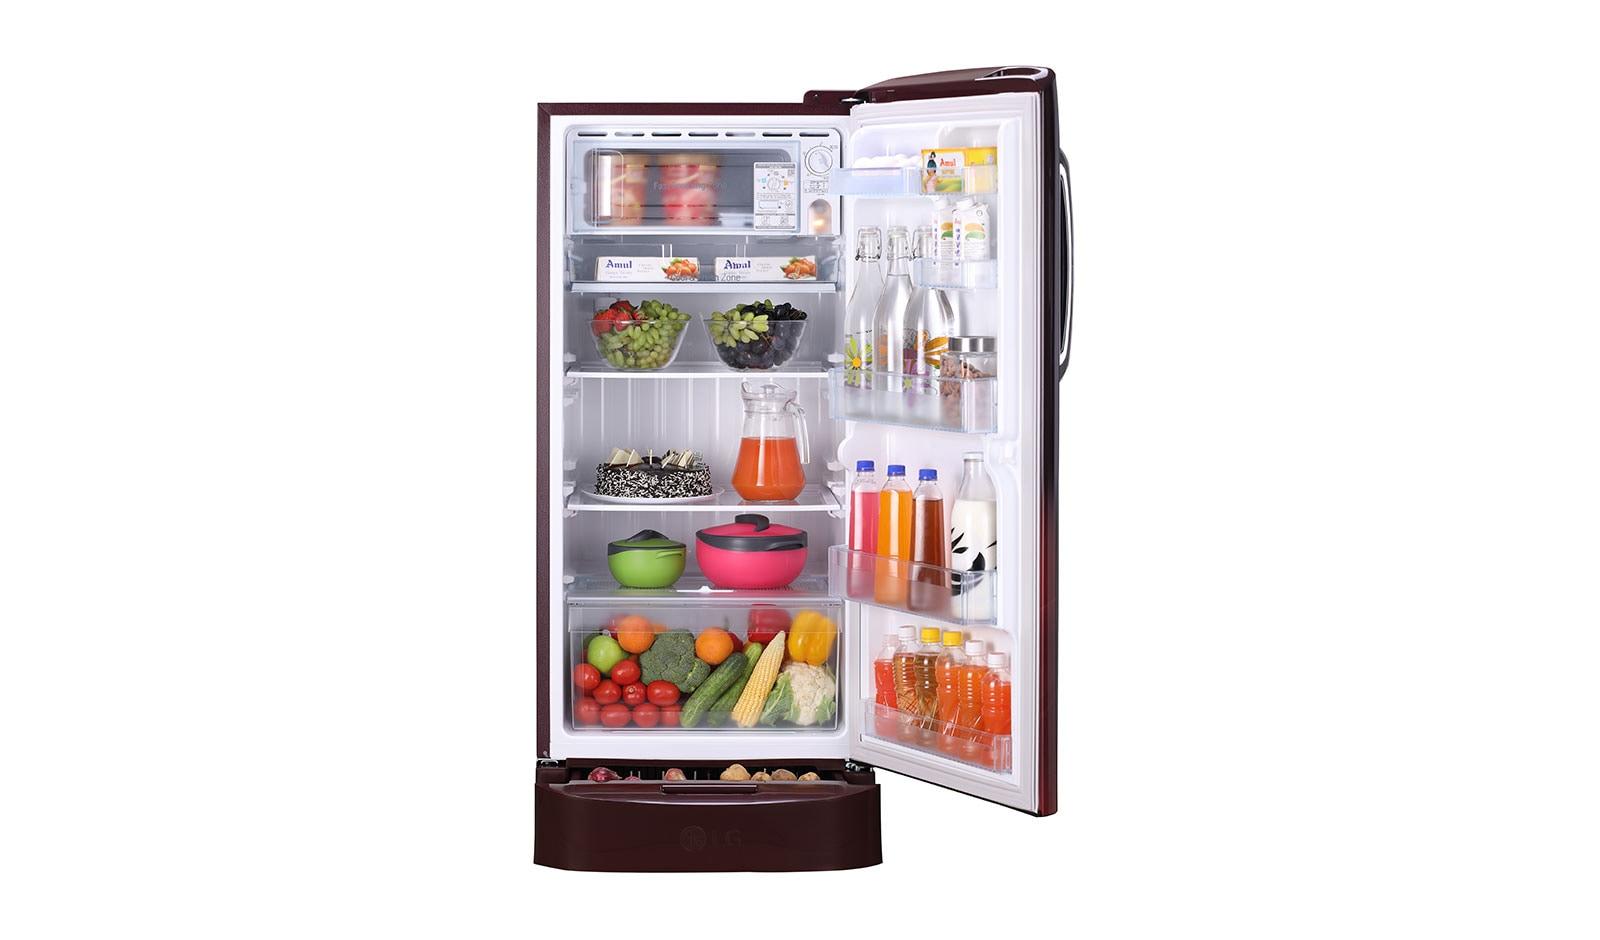 522fcf08248 LG GL-D221ASPY 215 L Single Door Refrigerator With 5 Star Rating ...